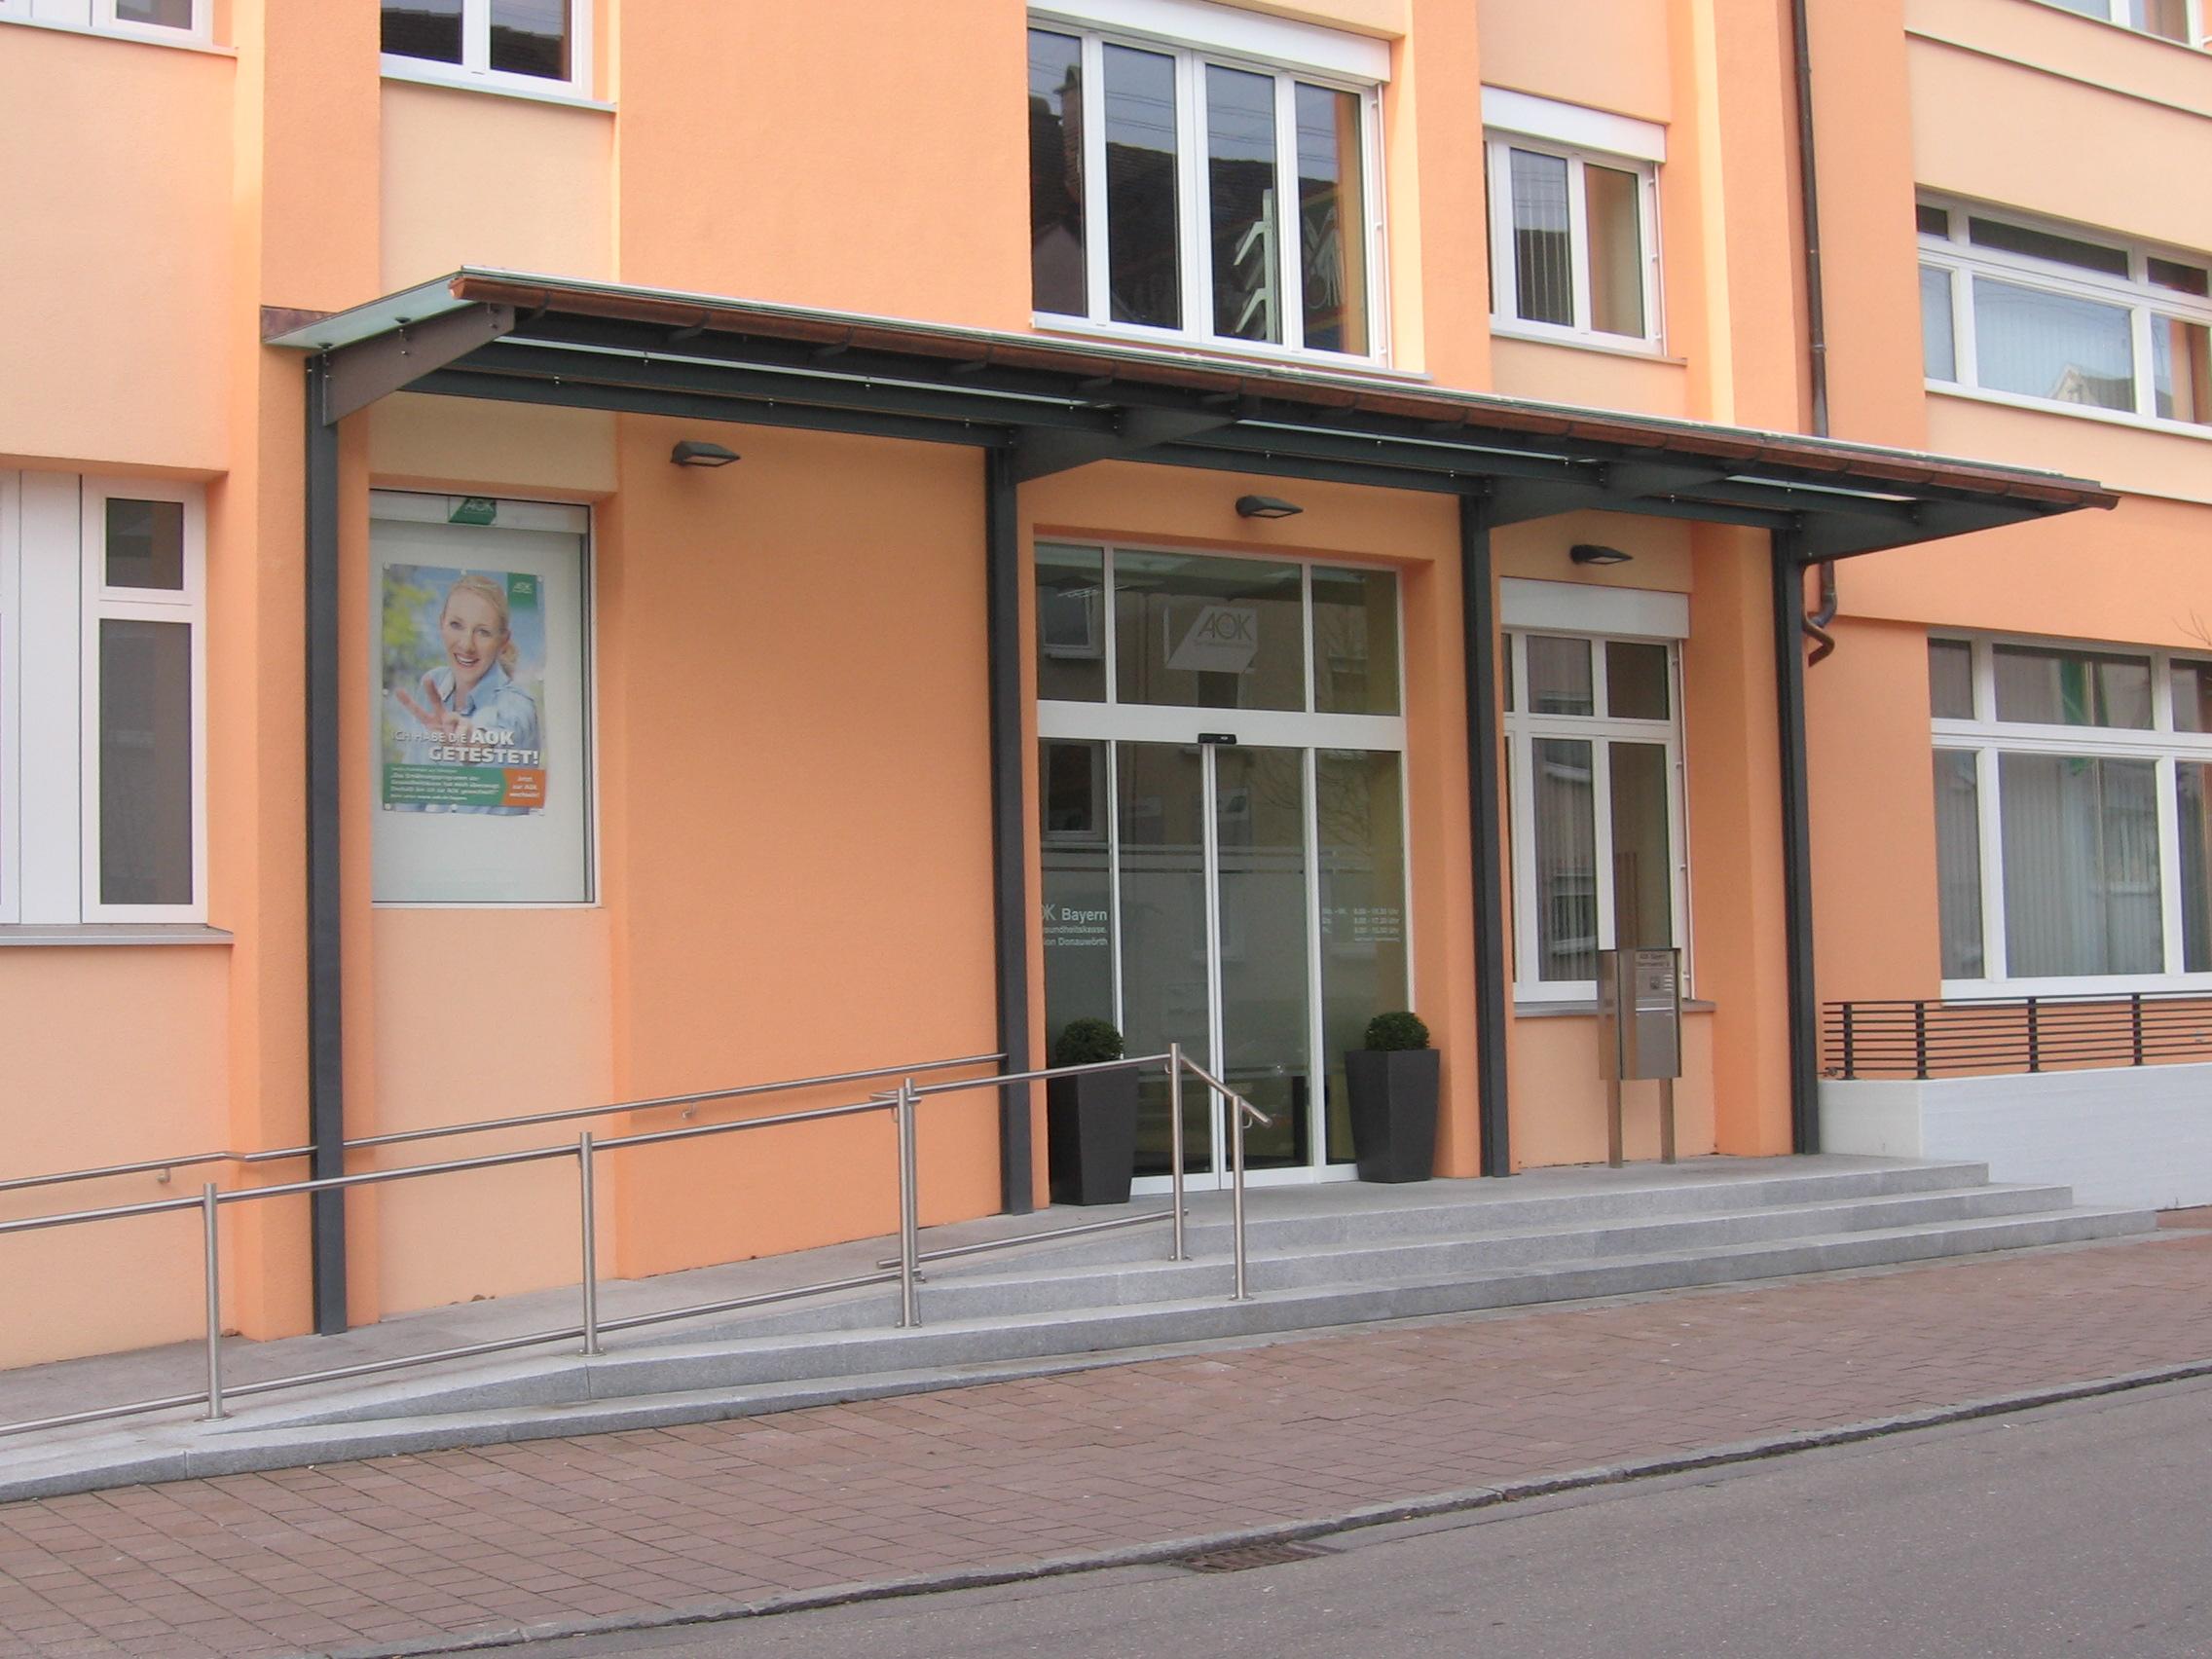 4-Fassadensanierung-AOK-Donauwörth-Überdachung-Eingang